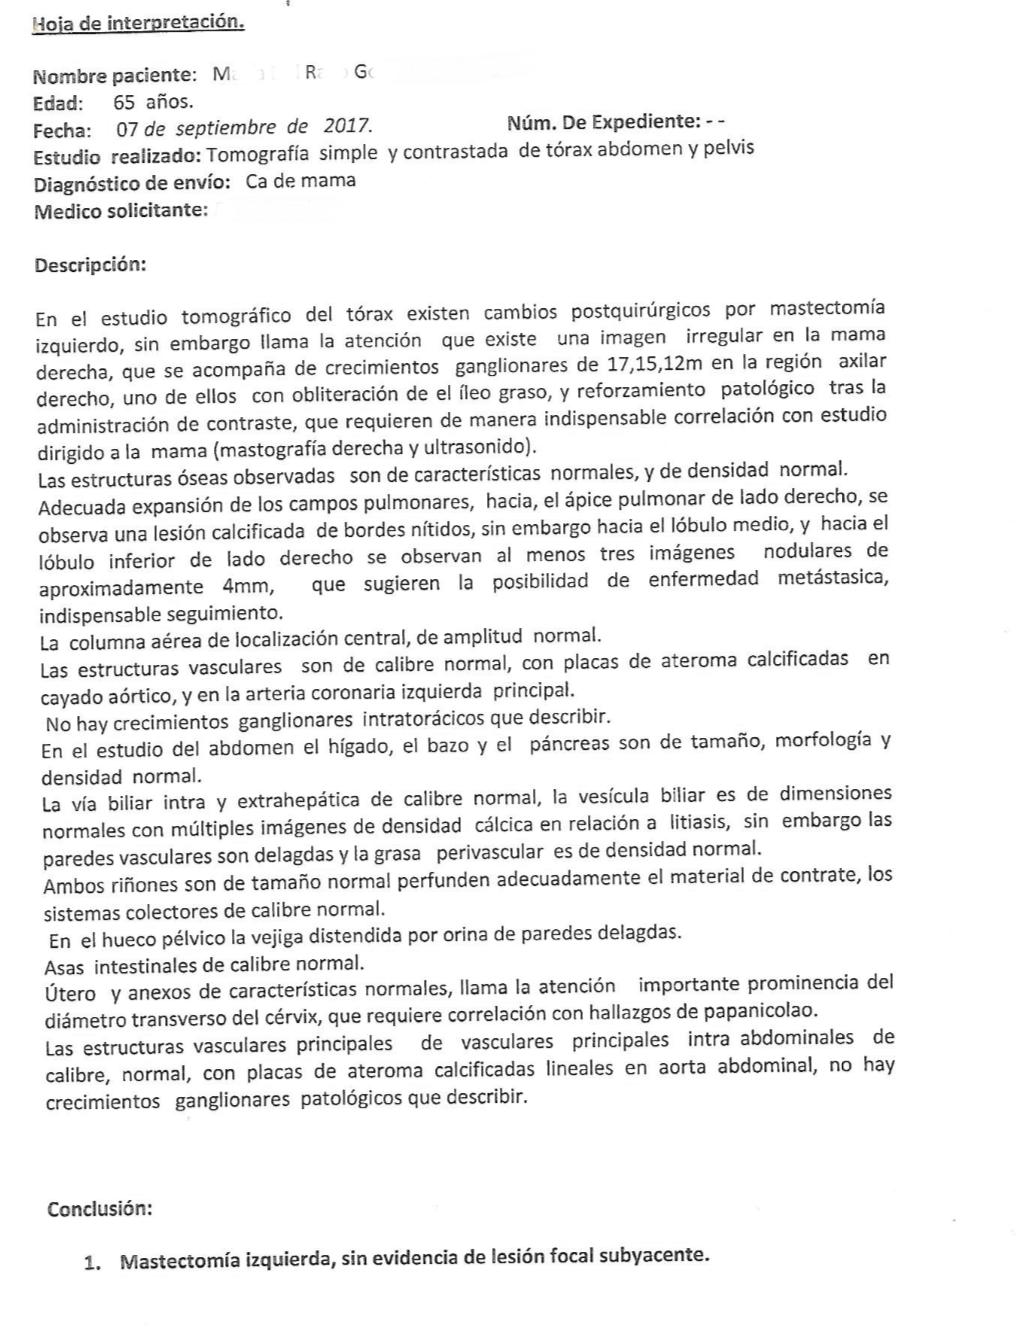 LifEscozul® - M.R.G. 5 - Cáncer de Mámas